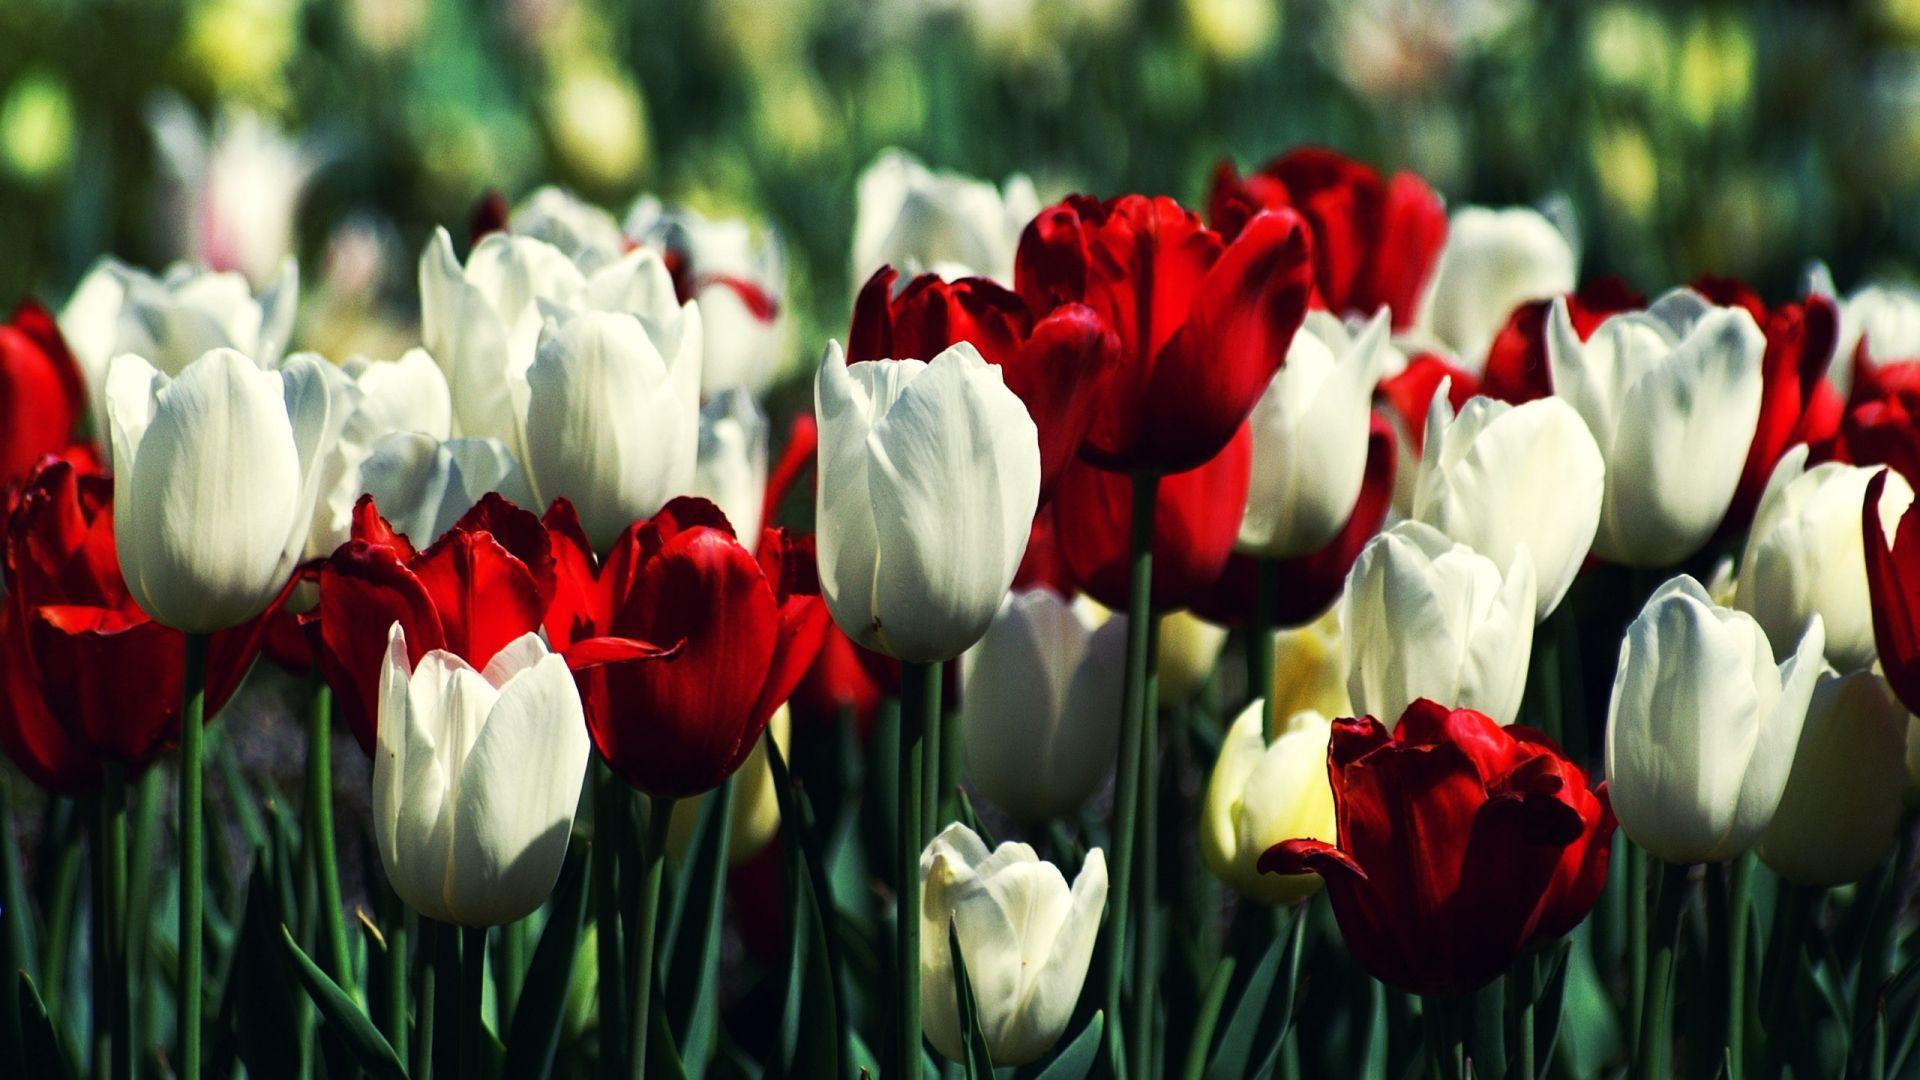 Hd Wallpapers 1080p Tulips Tulips Garden Spring Tulips Flowers